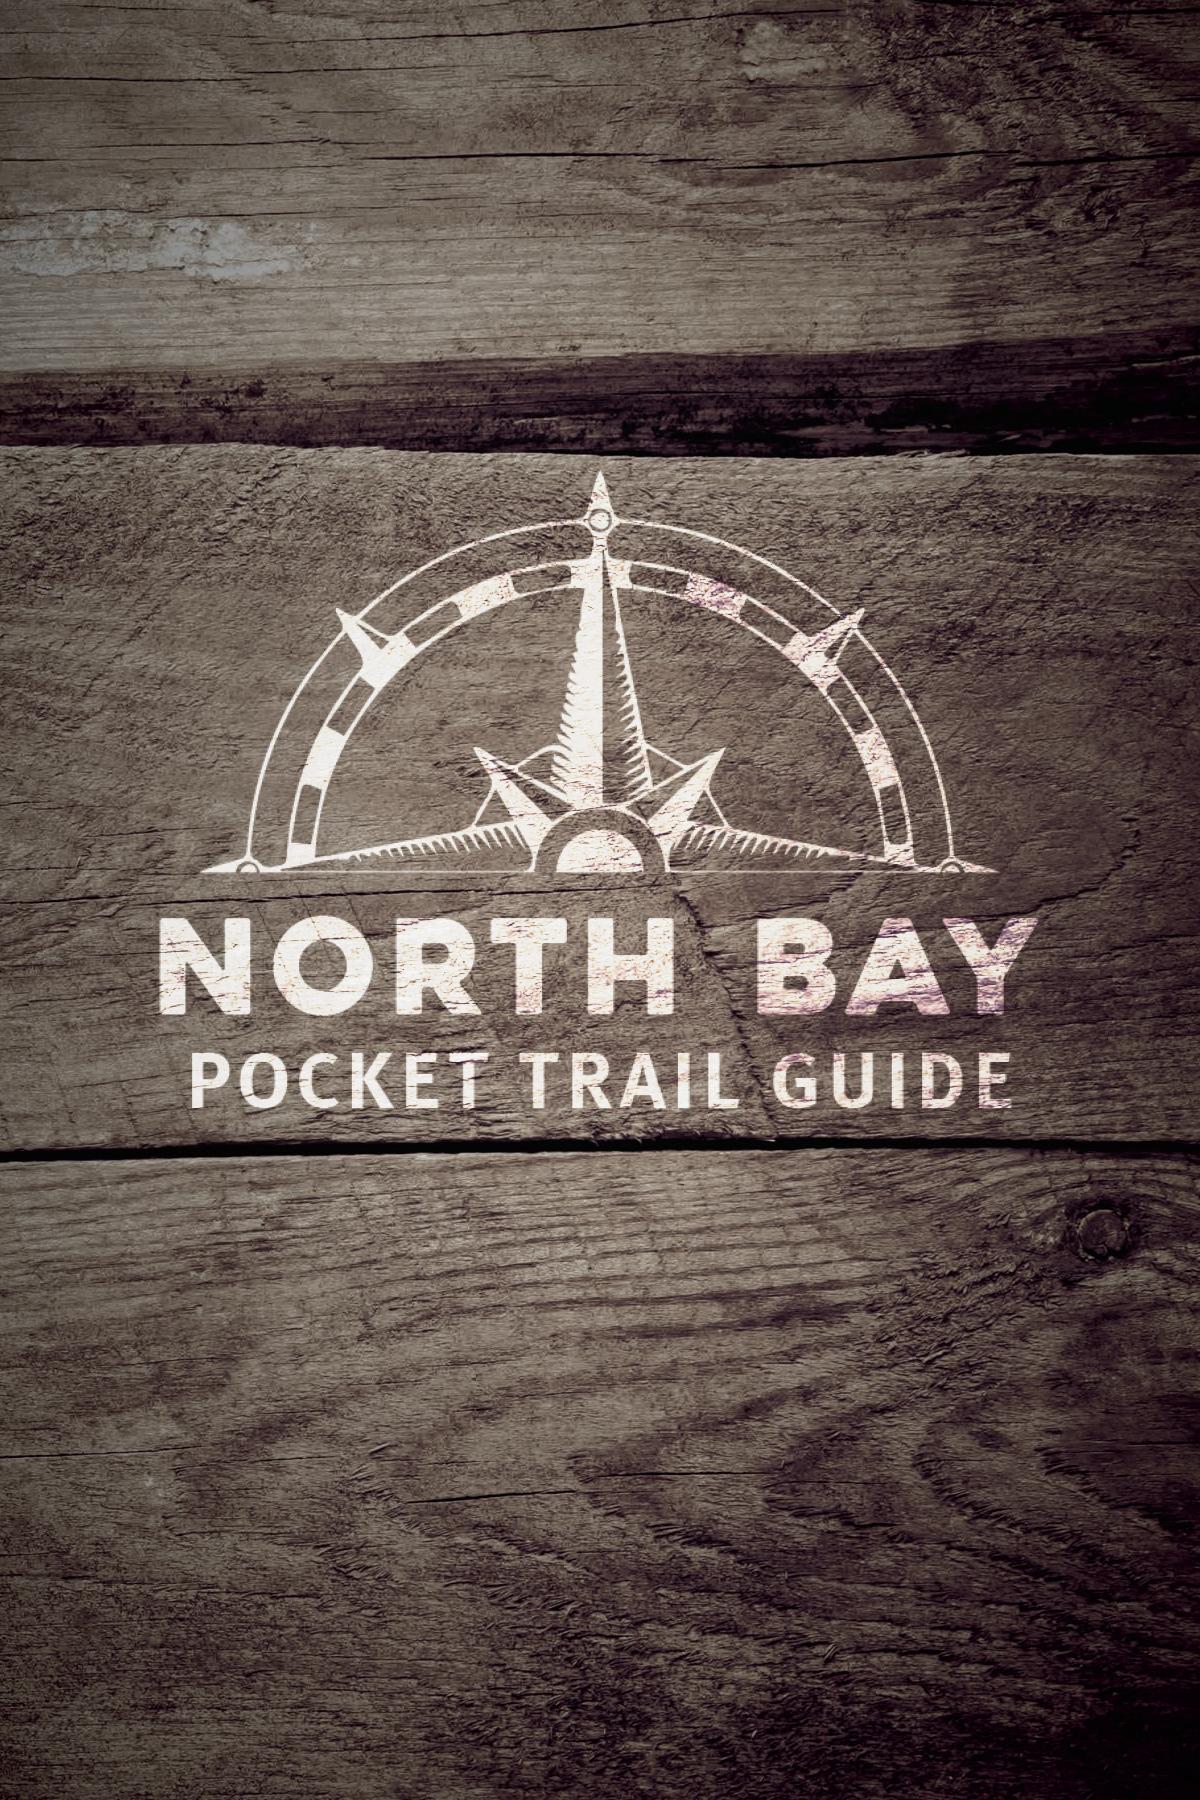 North Bay Pocket Trail Guide